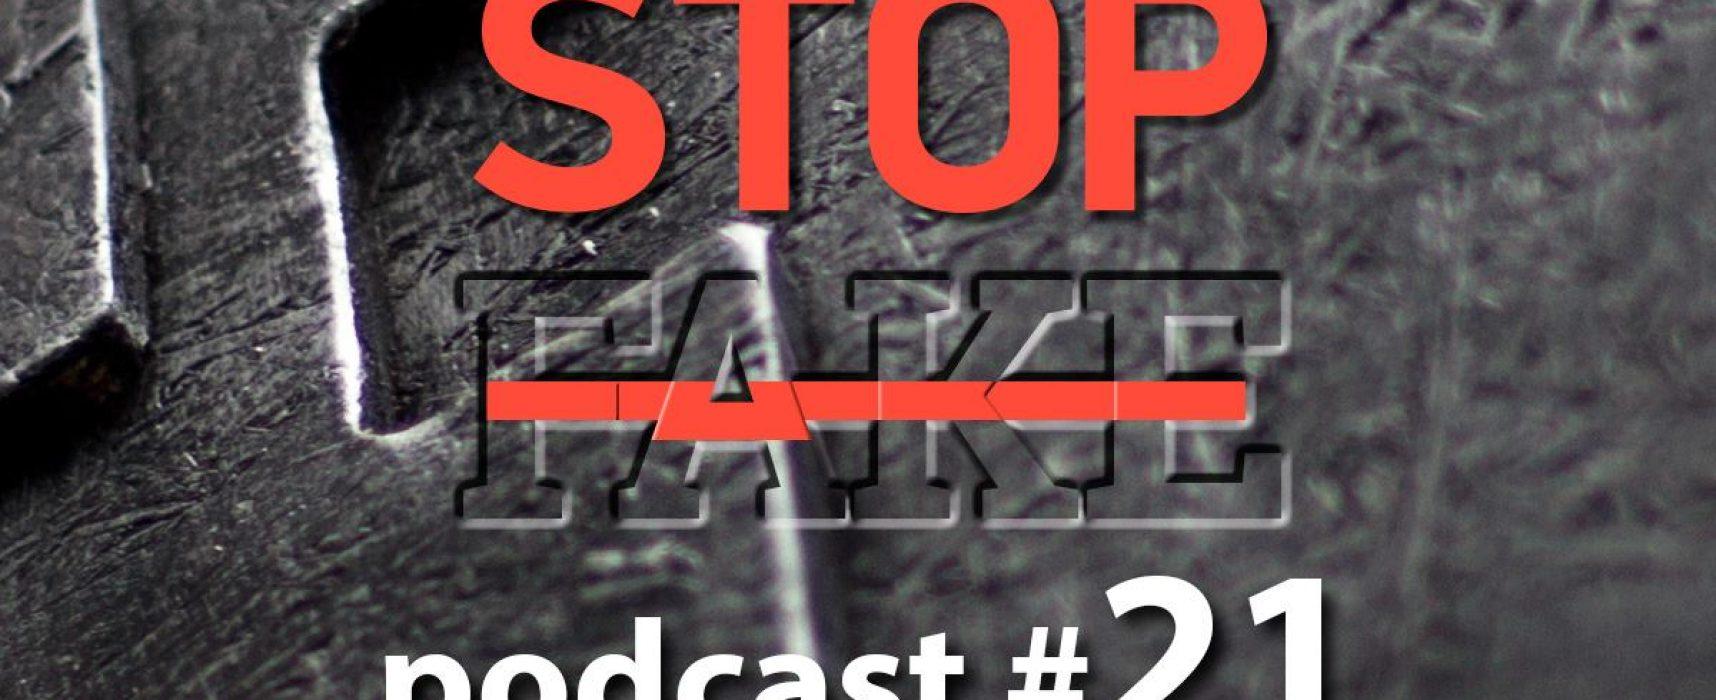 StopFake podcast #21